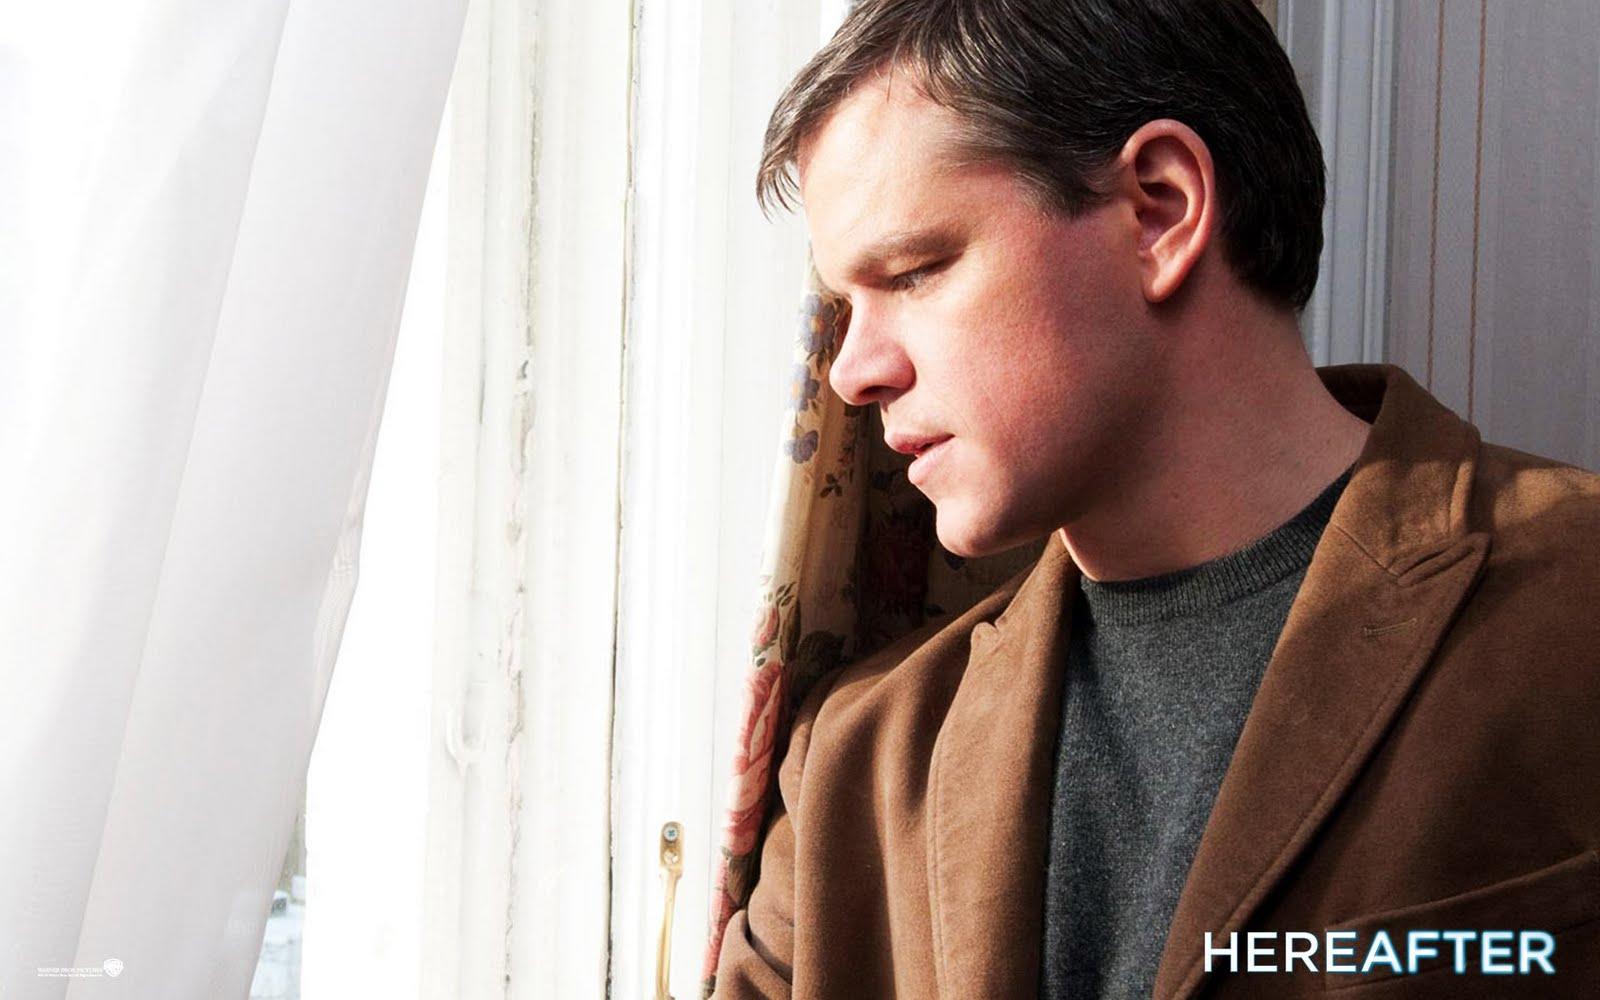 http://2.bp.blogspot.com/-stvxMS-MvNQ/TdTq-wNLE0I/AAAAAAAAAI8/JkiPSAdEWKY/s1600/Matt_Damon_in_Hereafter-2.jpg